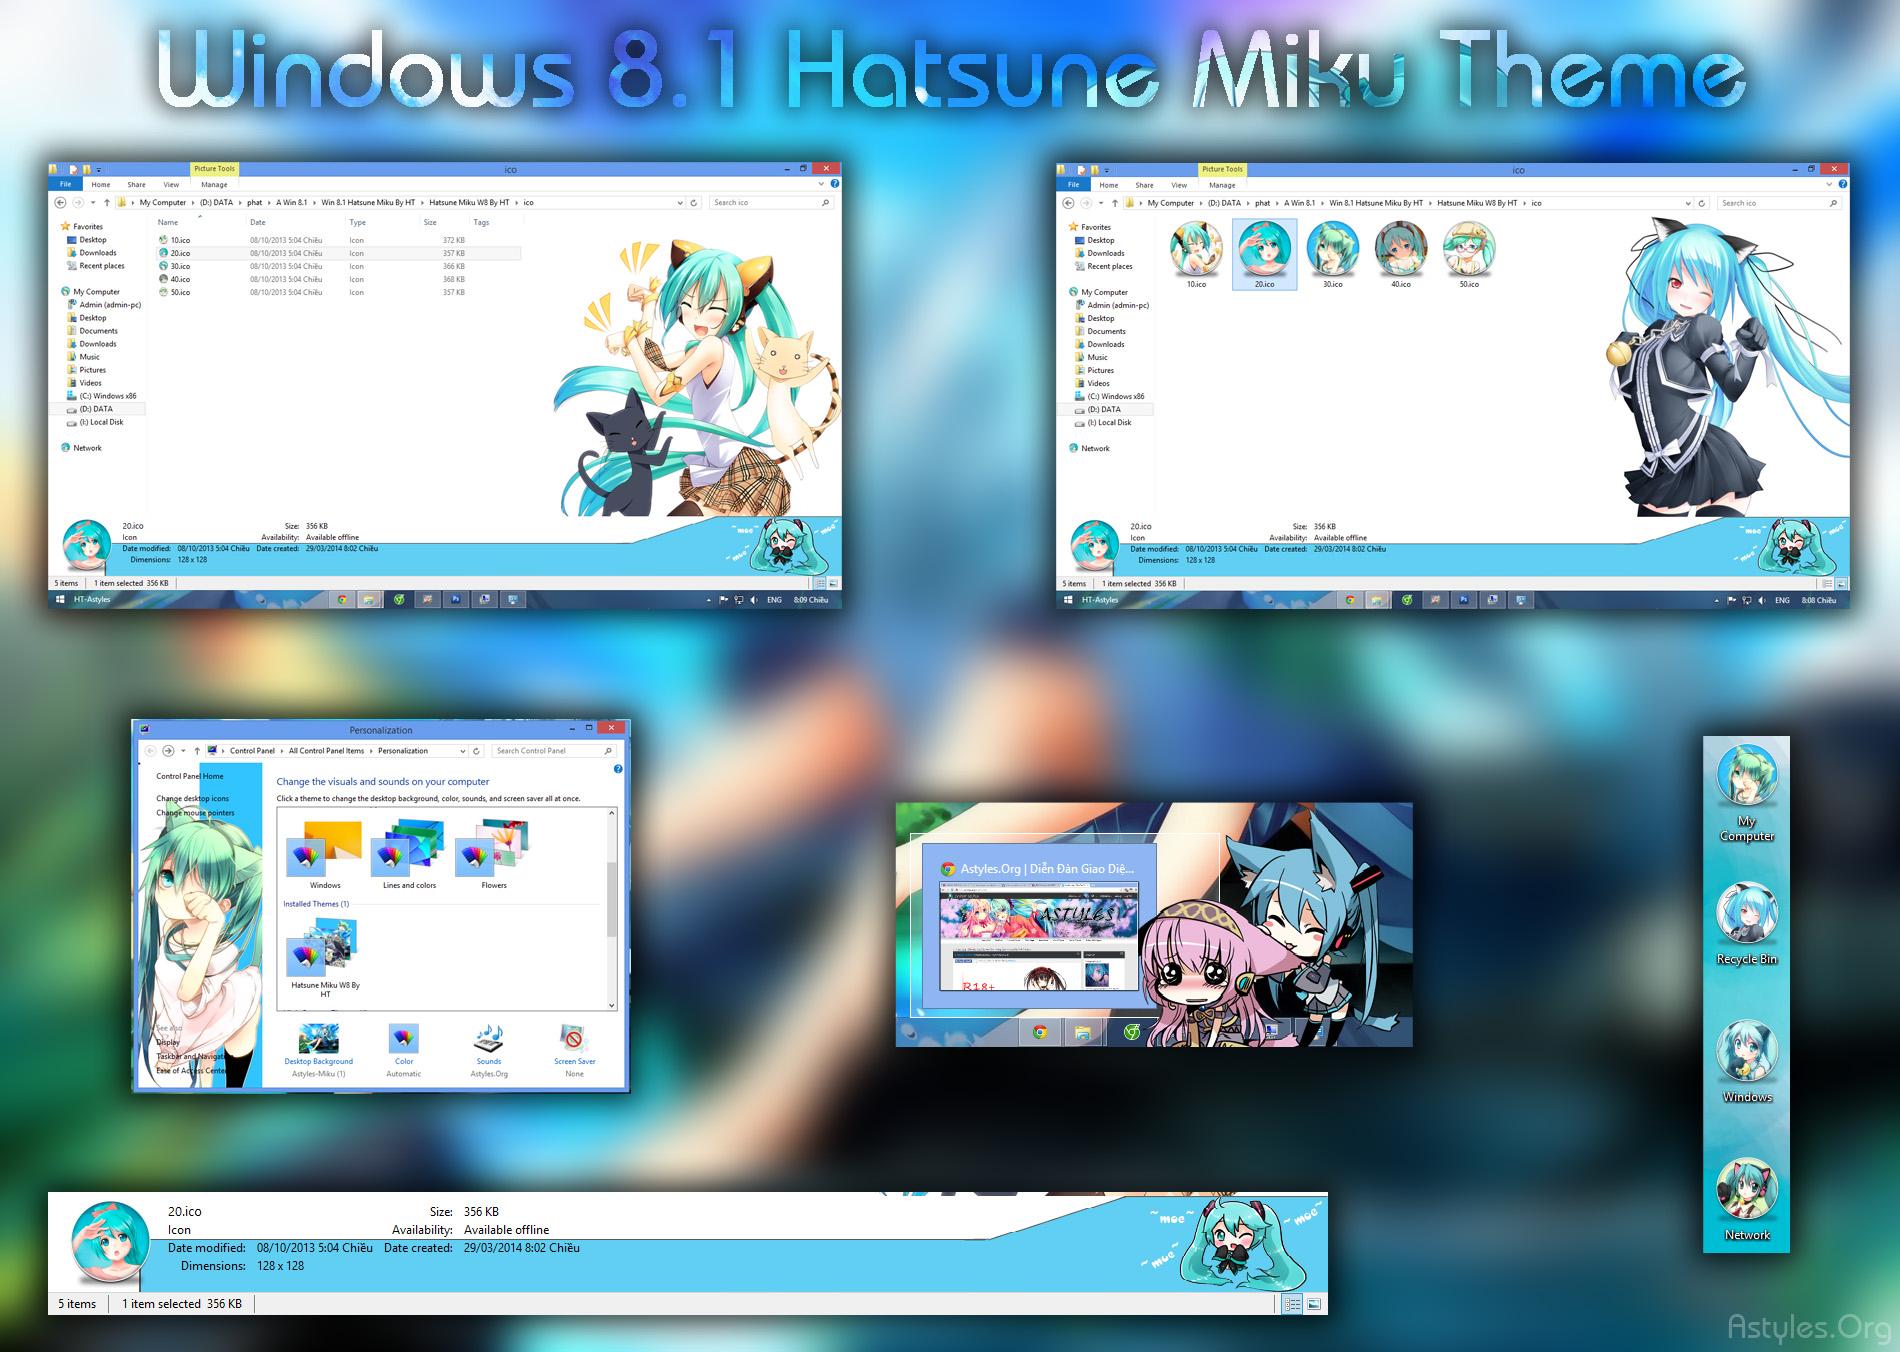 Windows 7 anime skin pack free download | Best Windows 10